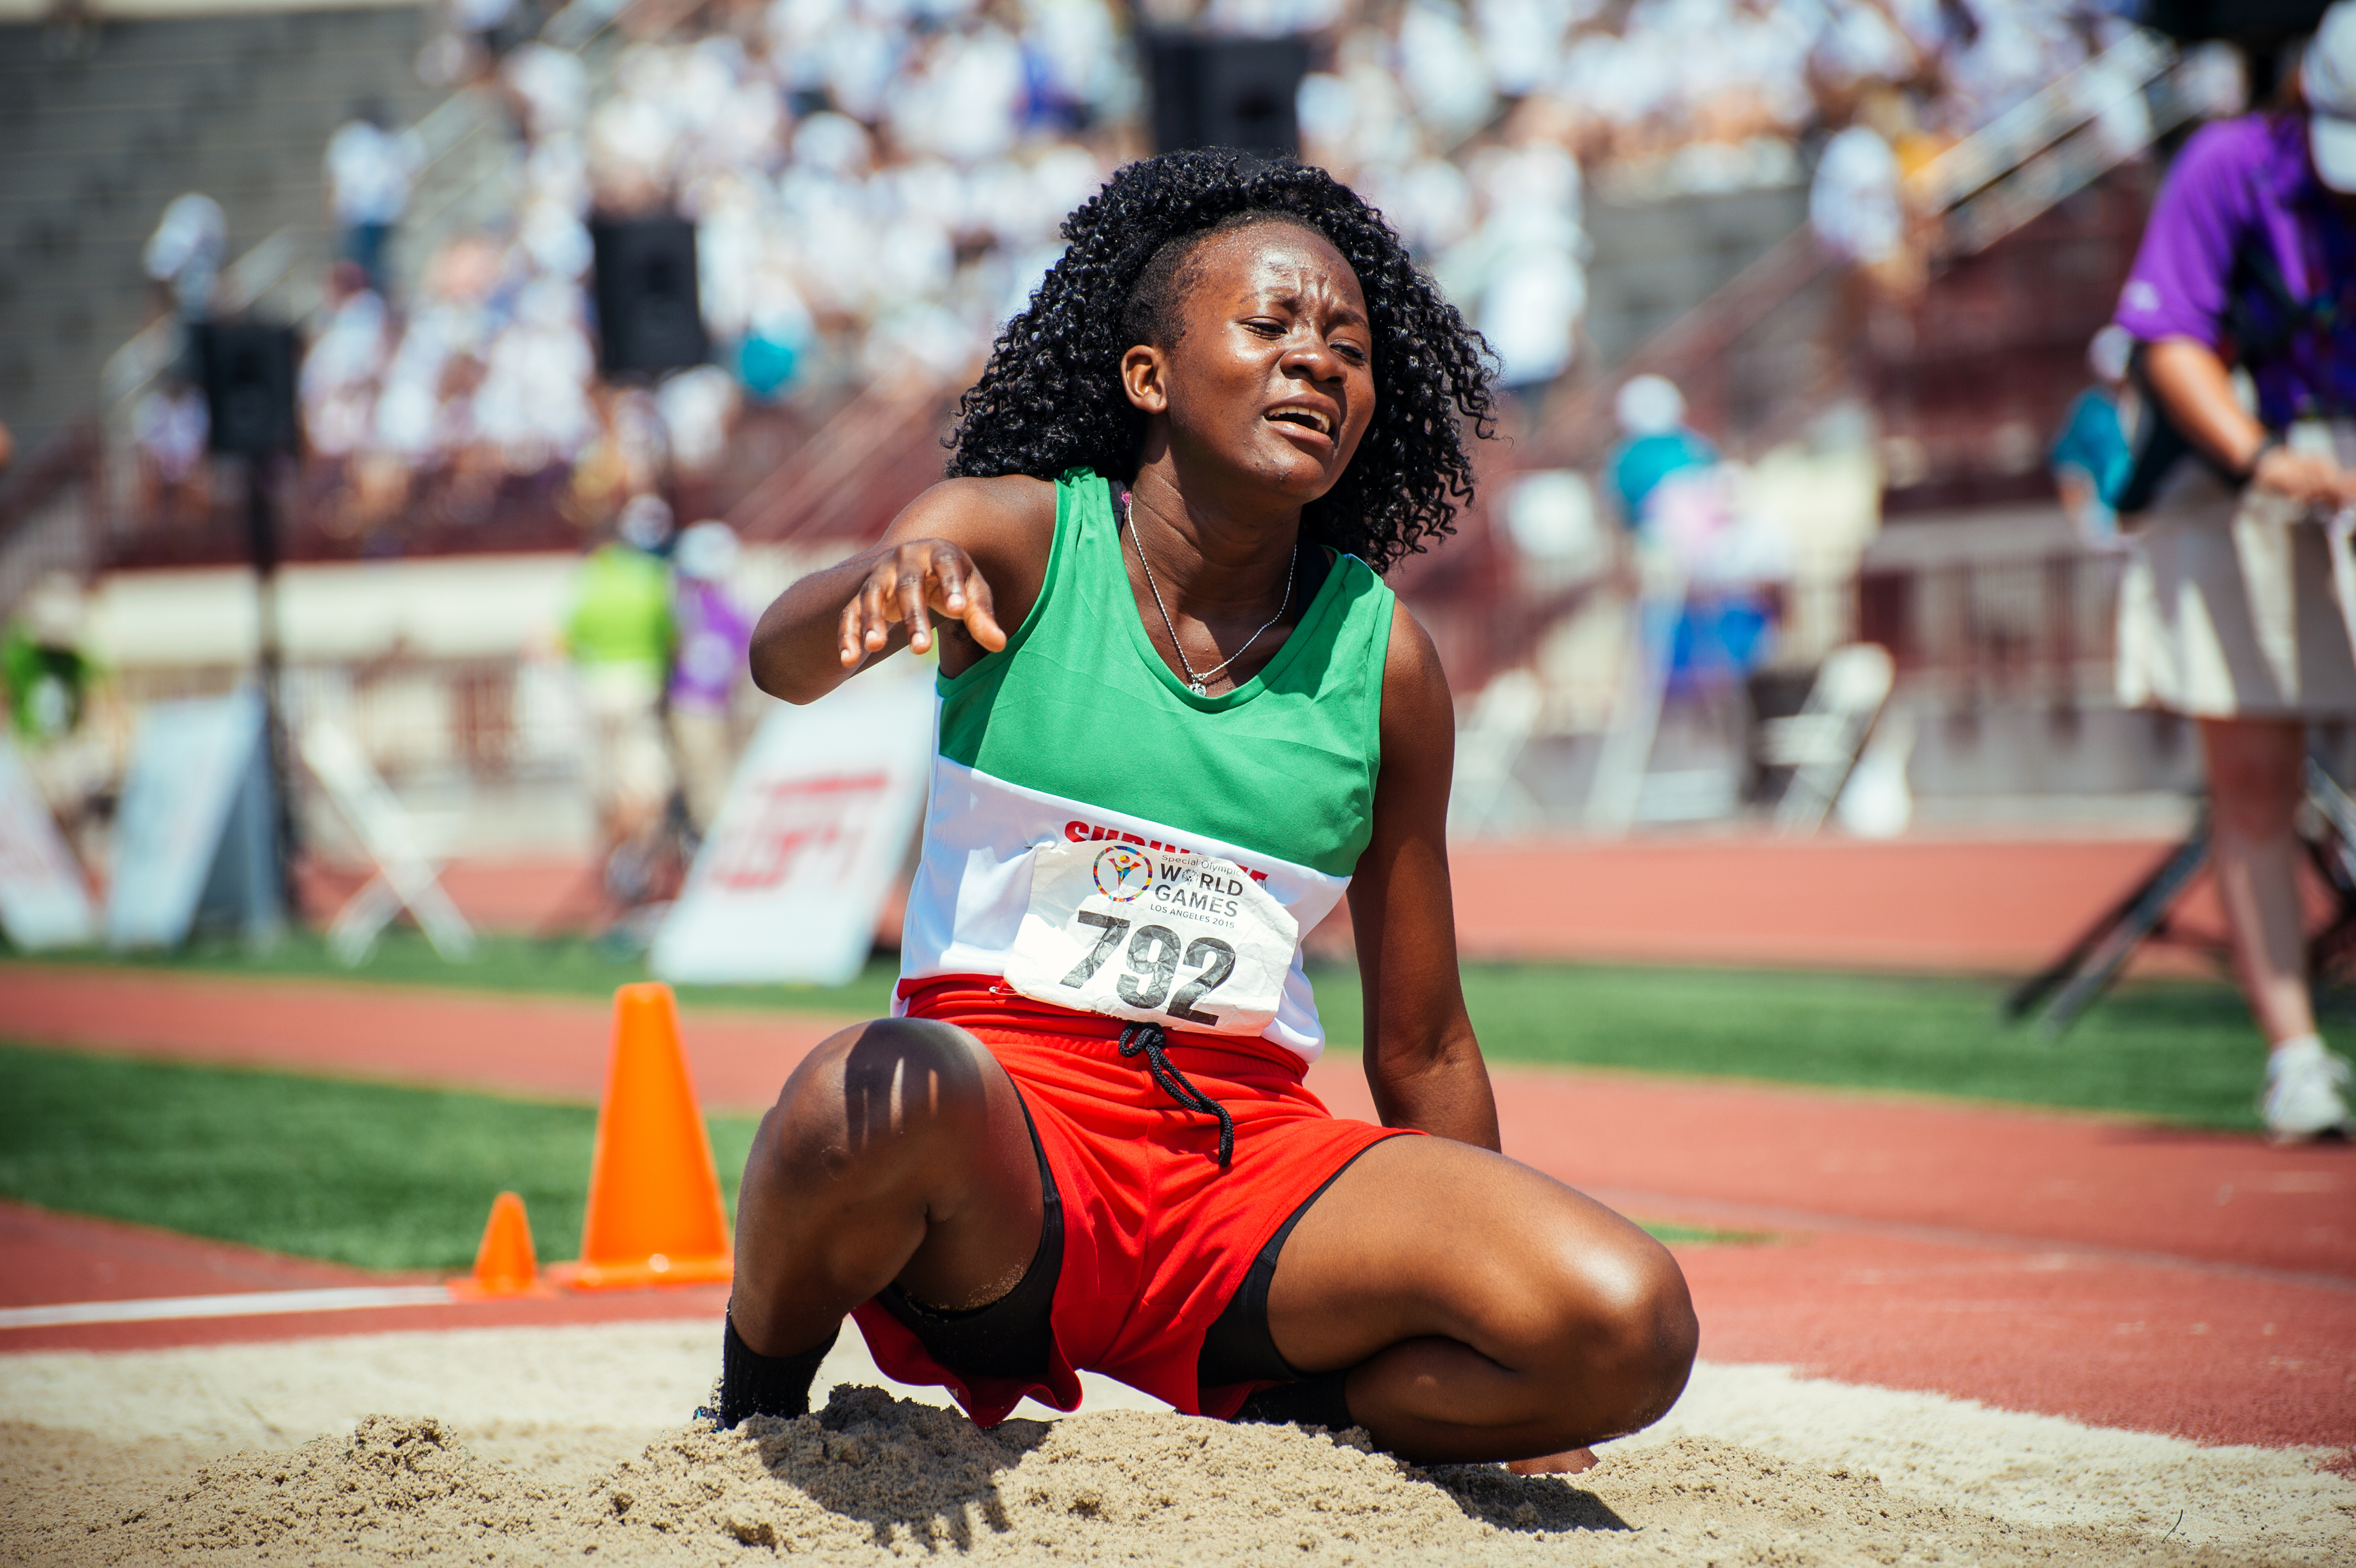 Long jumper, Special Olympics World Games 2015